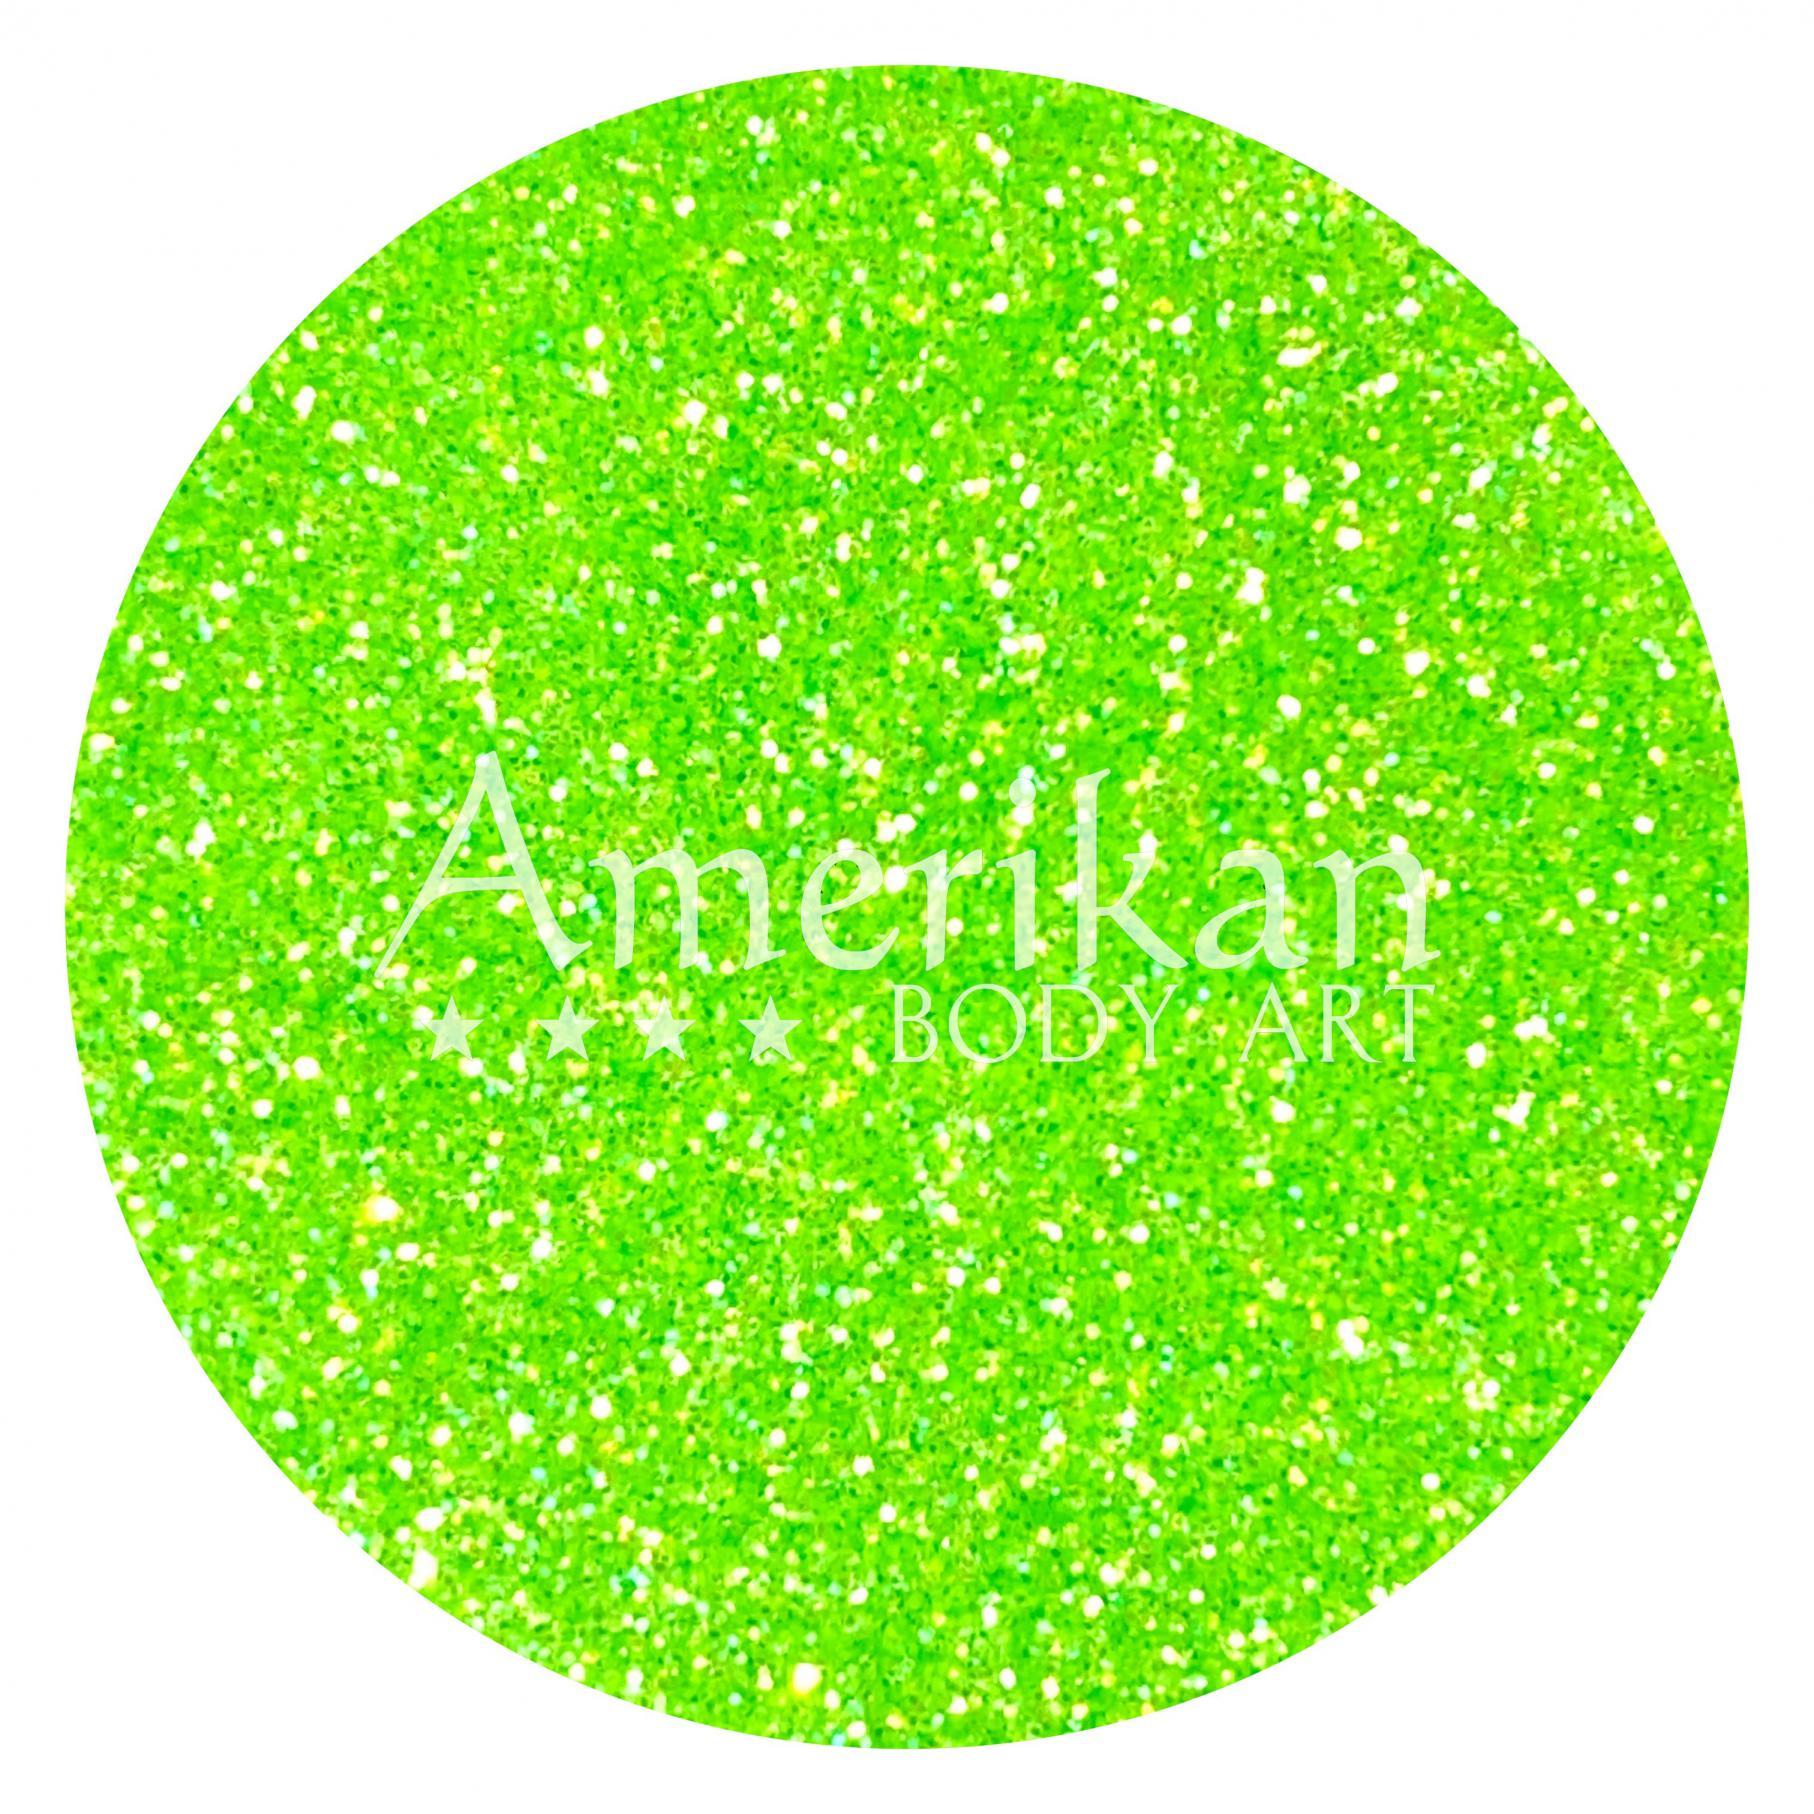 Limelicious Sparkle Glitter